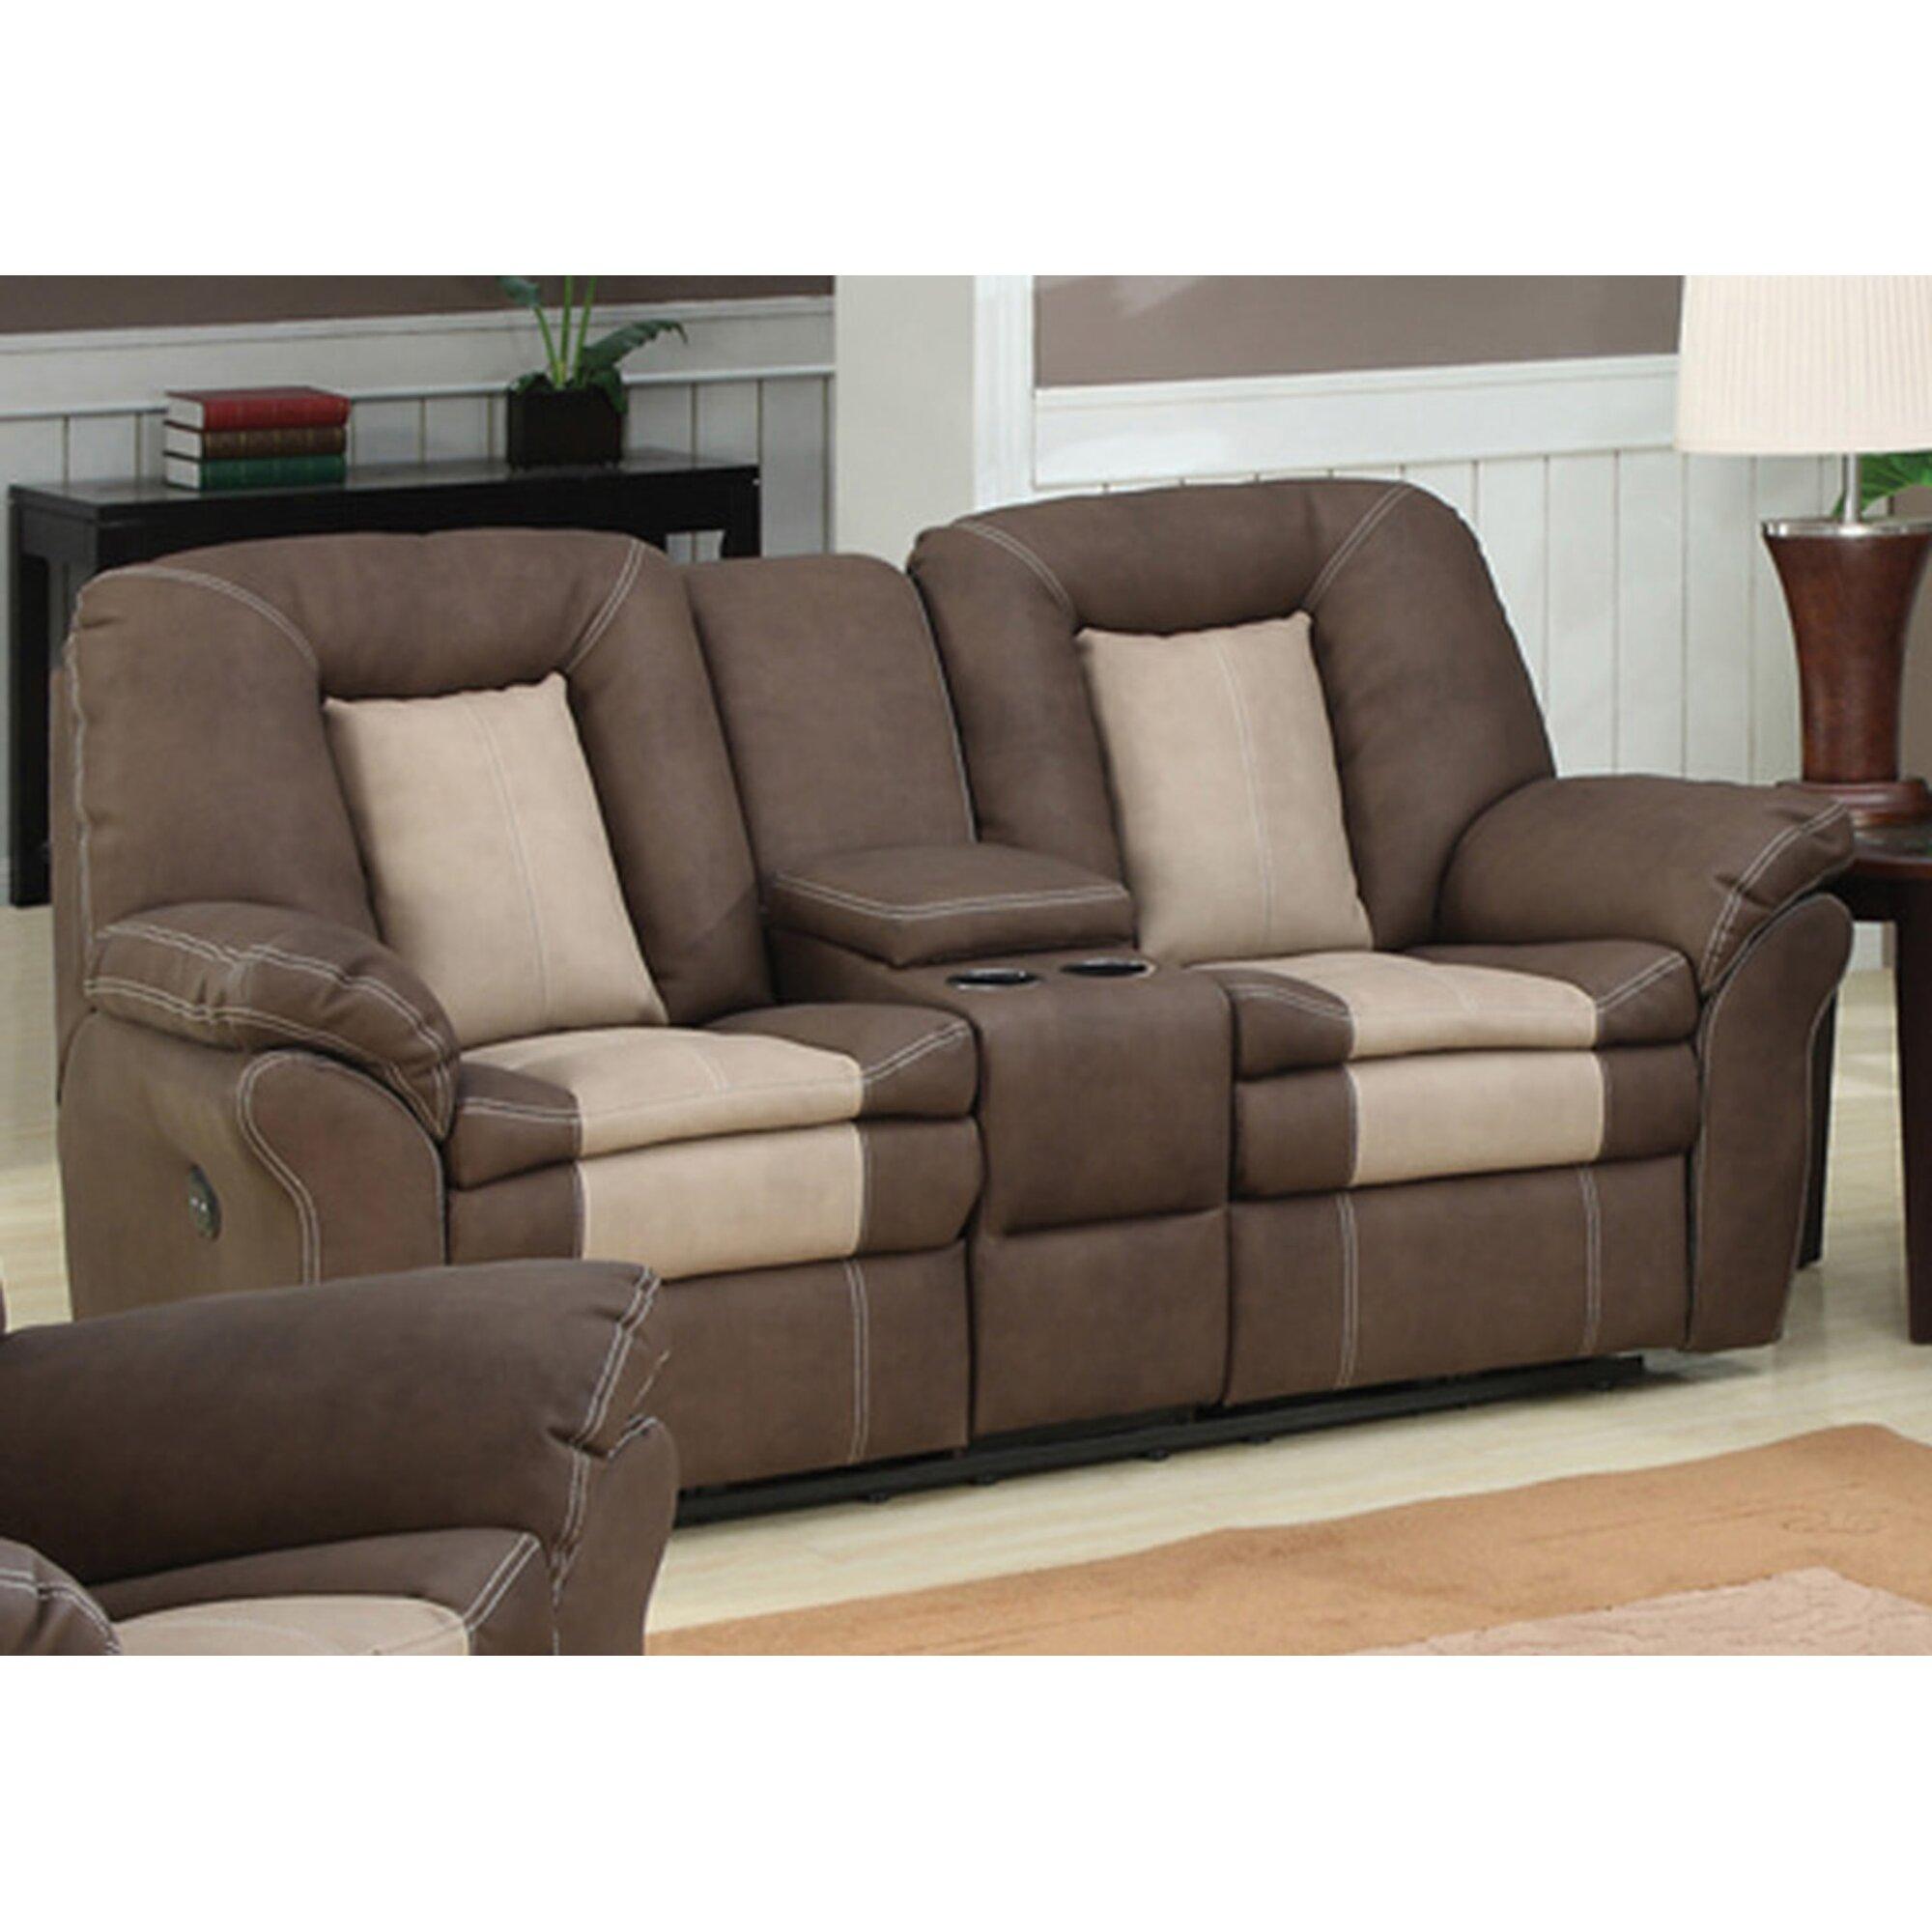 Ac pacific carson plush living room dual reclining sofa for Plush living room furniture